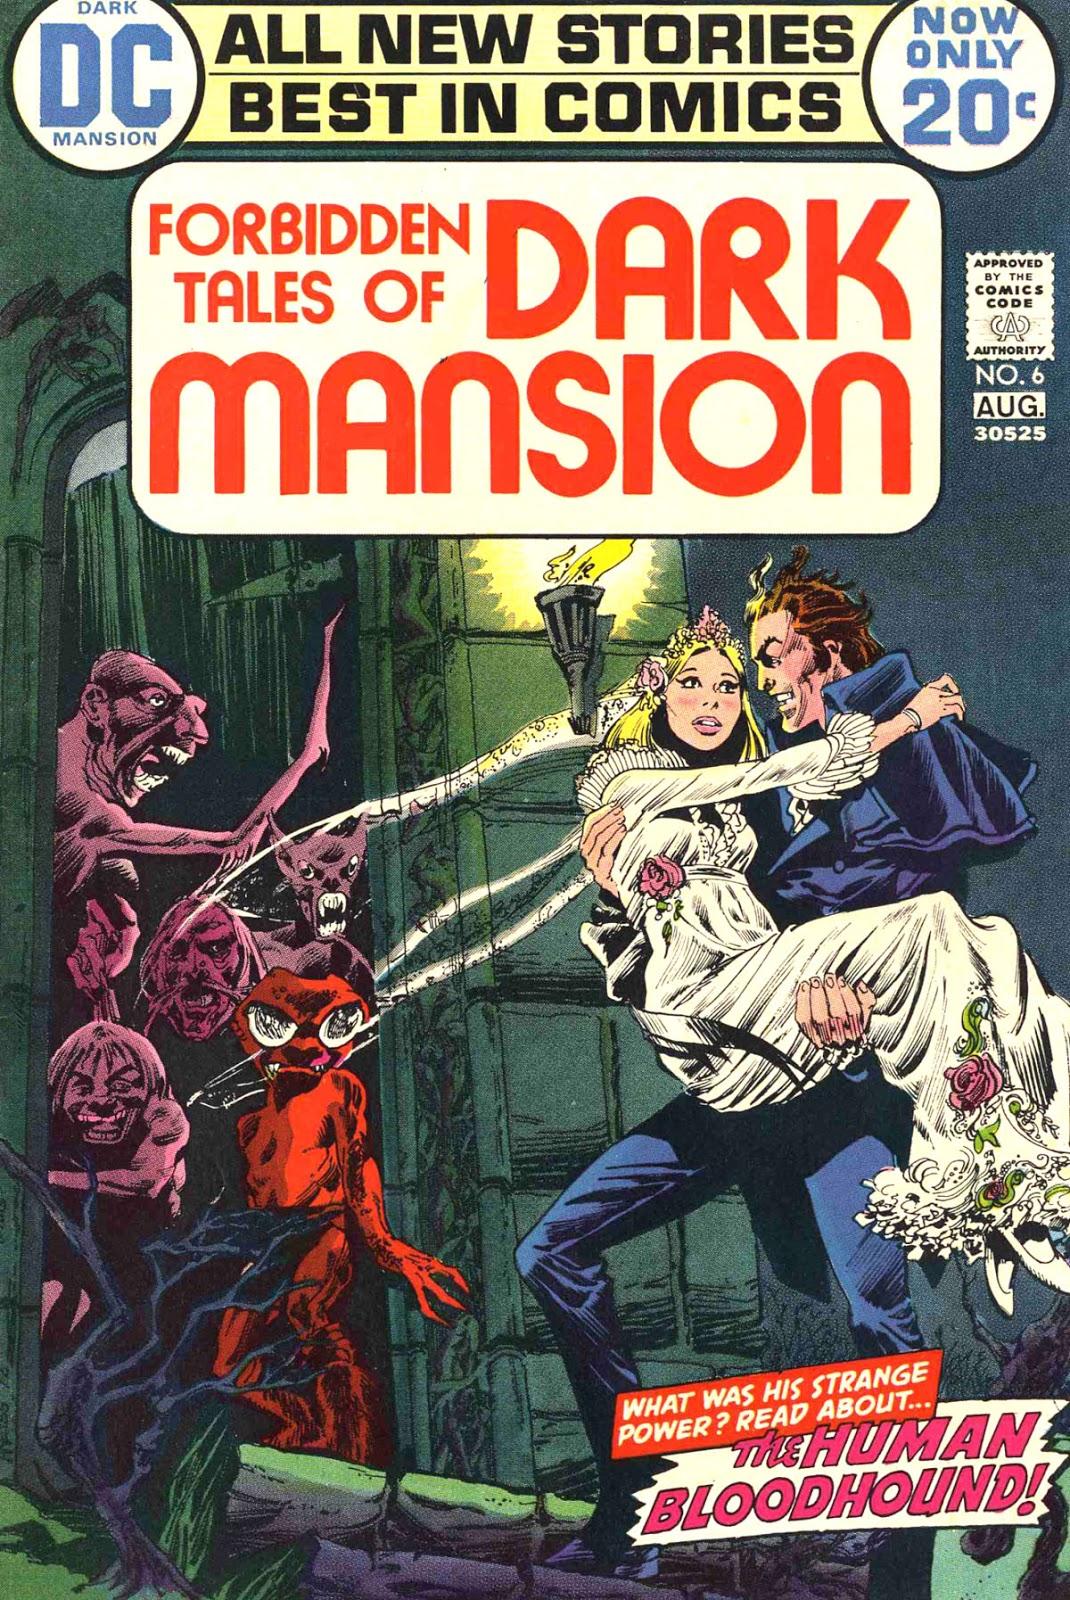 Forbidden Tales of Dark Mansion 6 Page 1